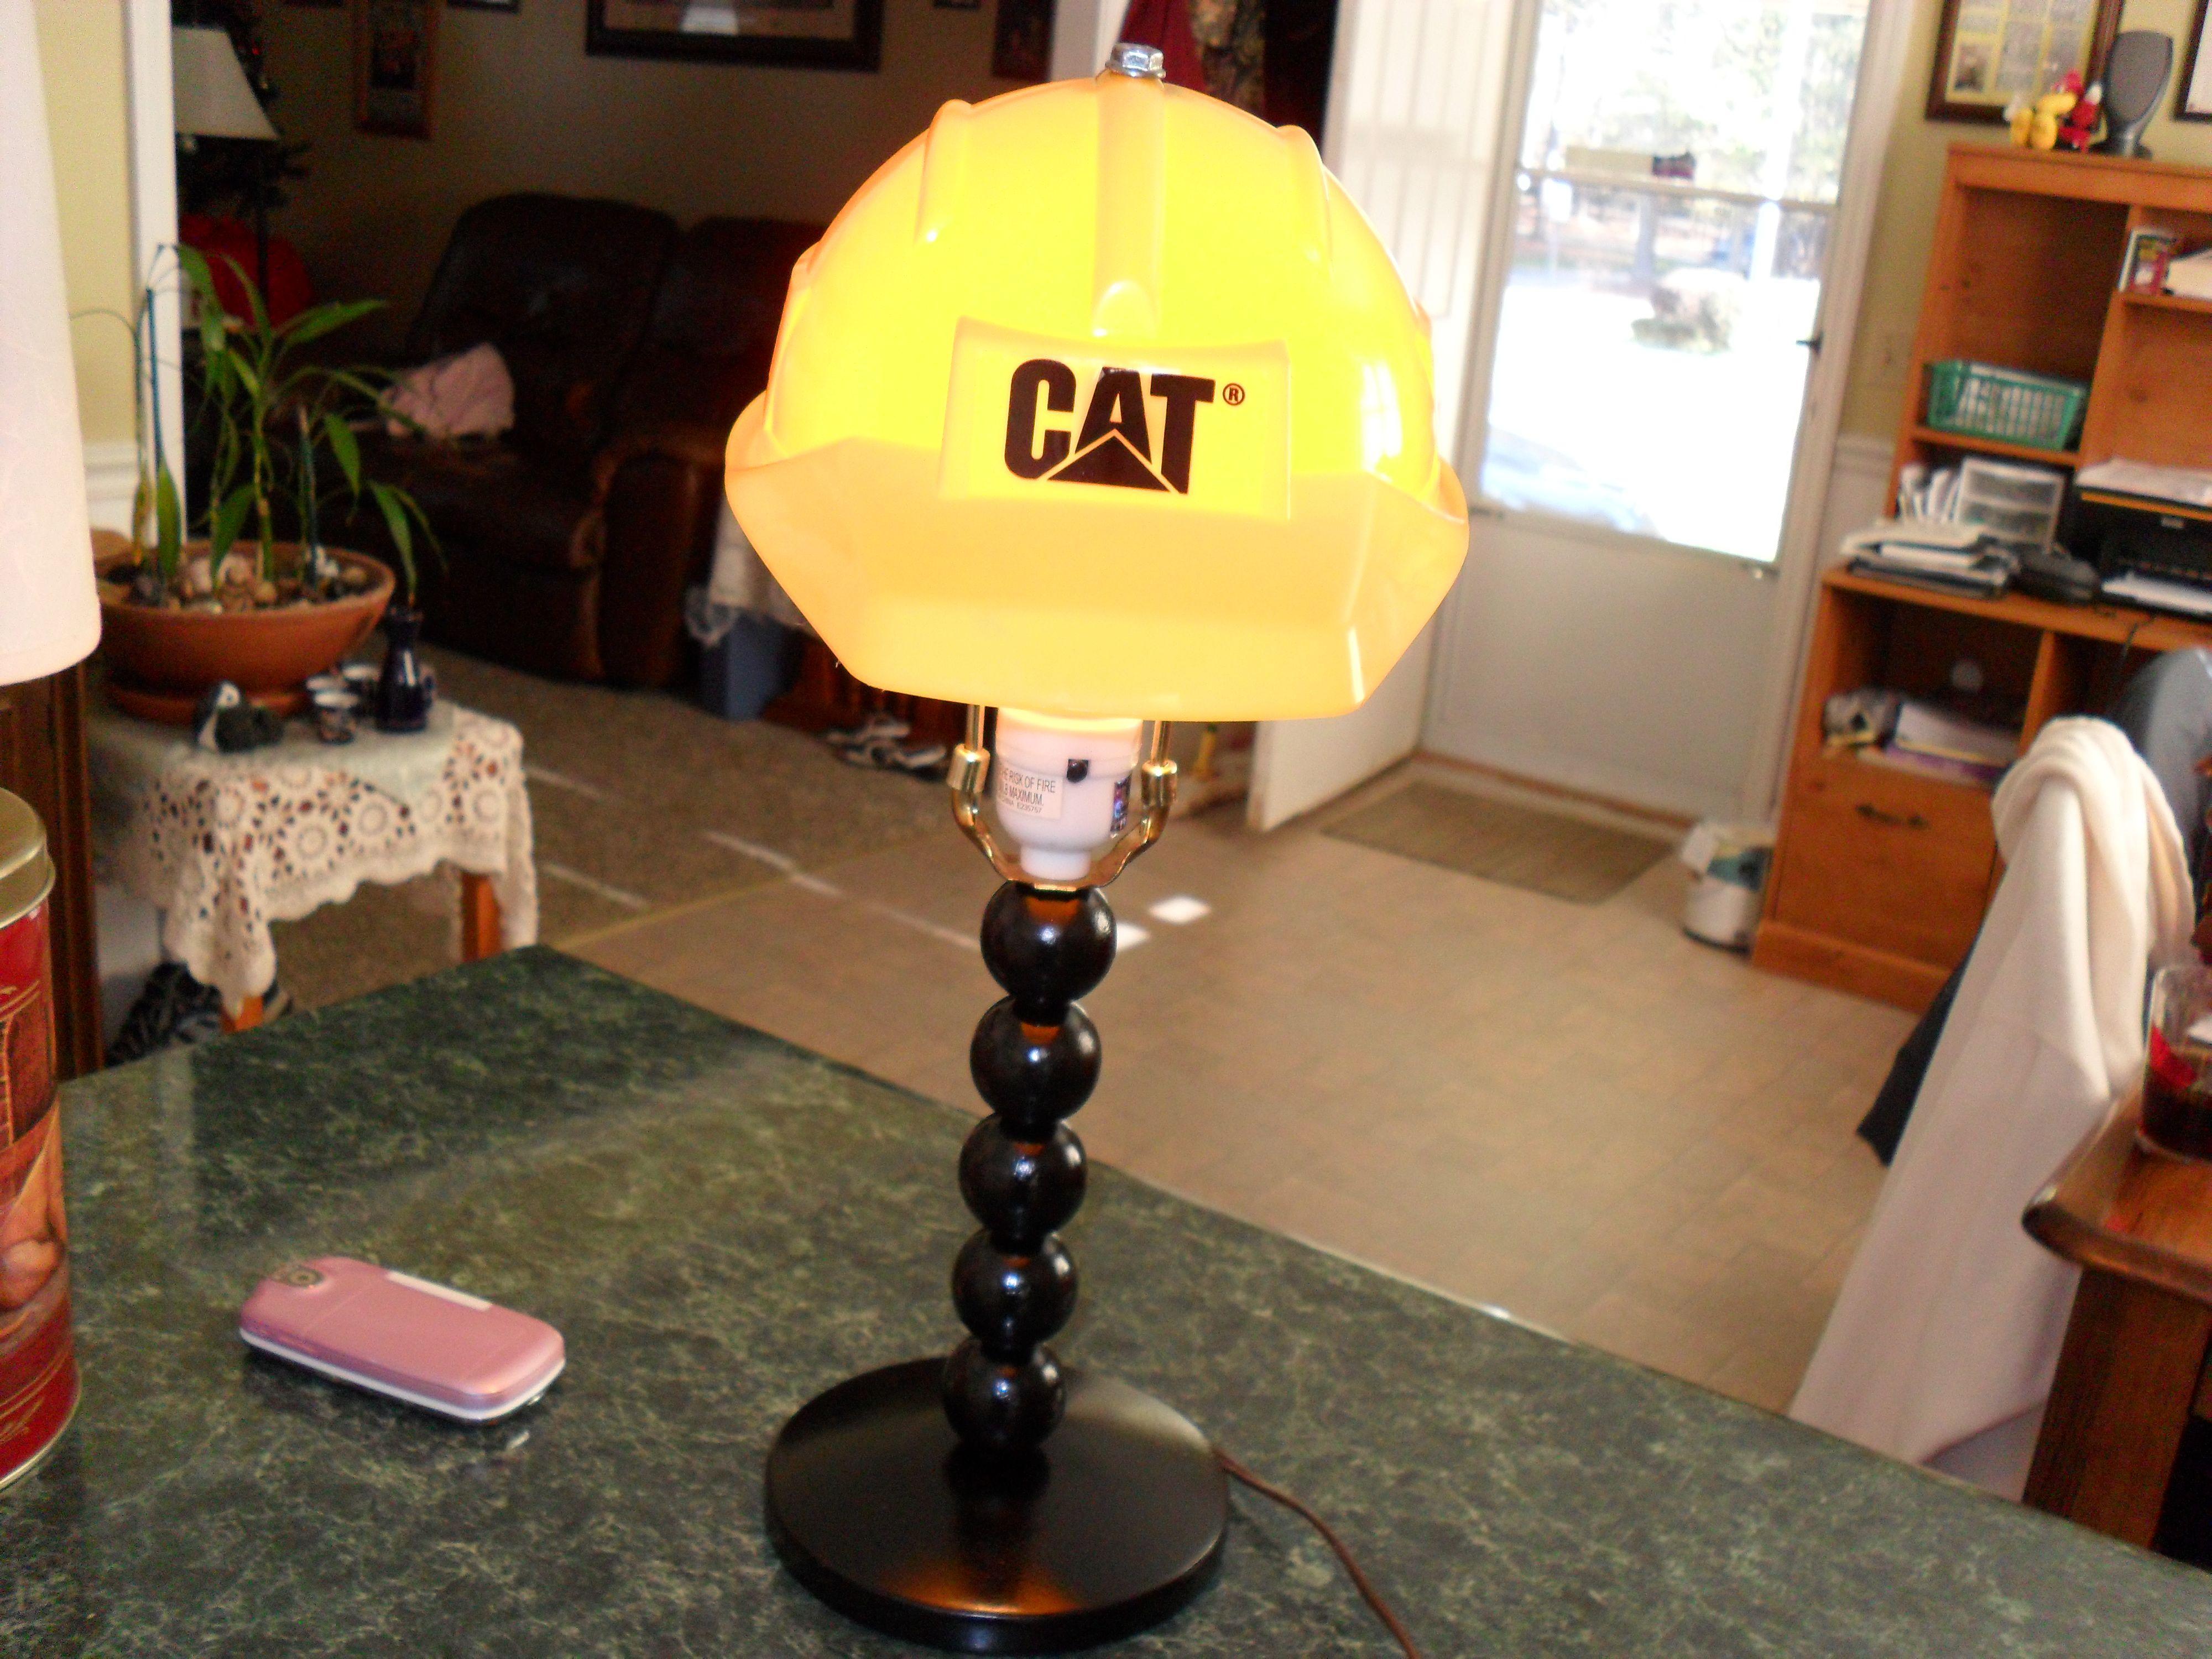 CAT HARD HAT LAMP CAT HARD HAT